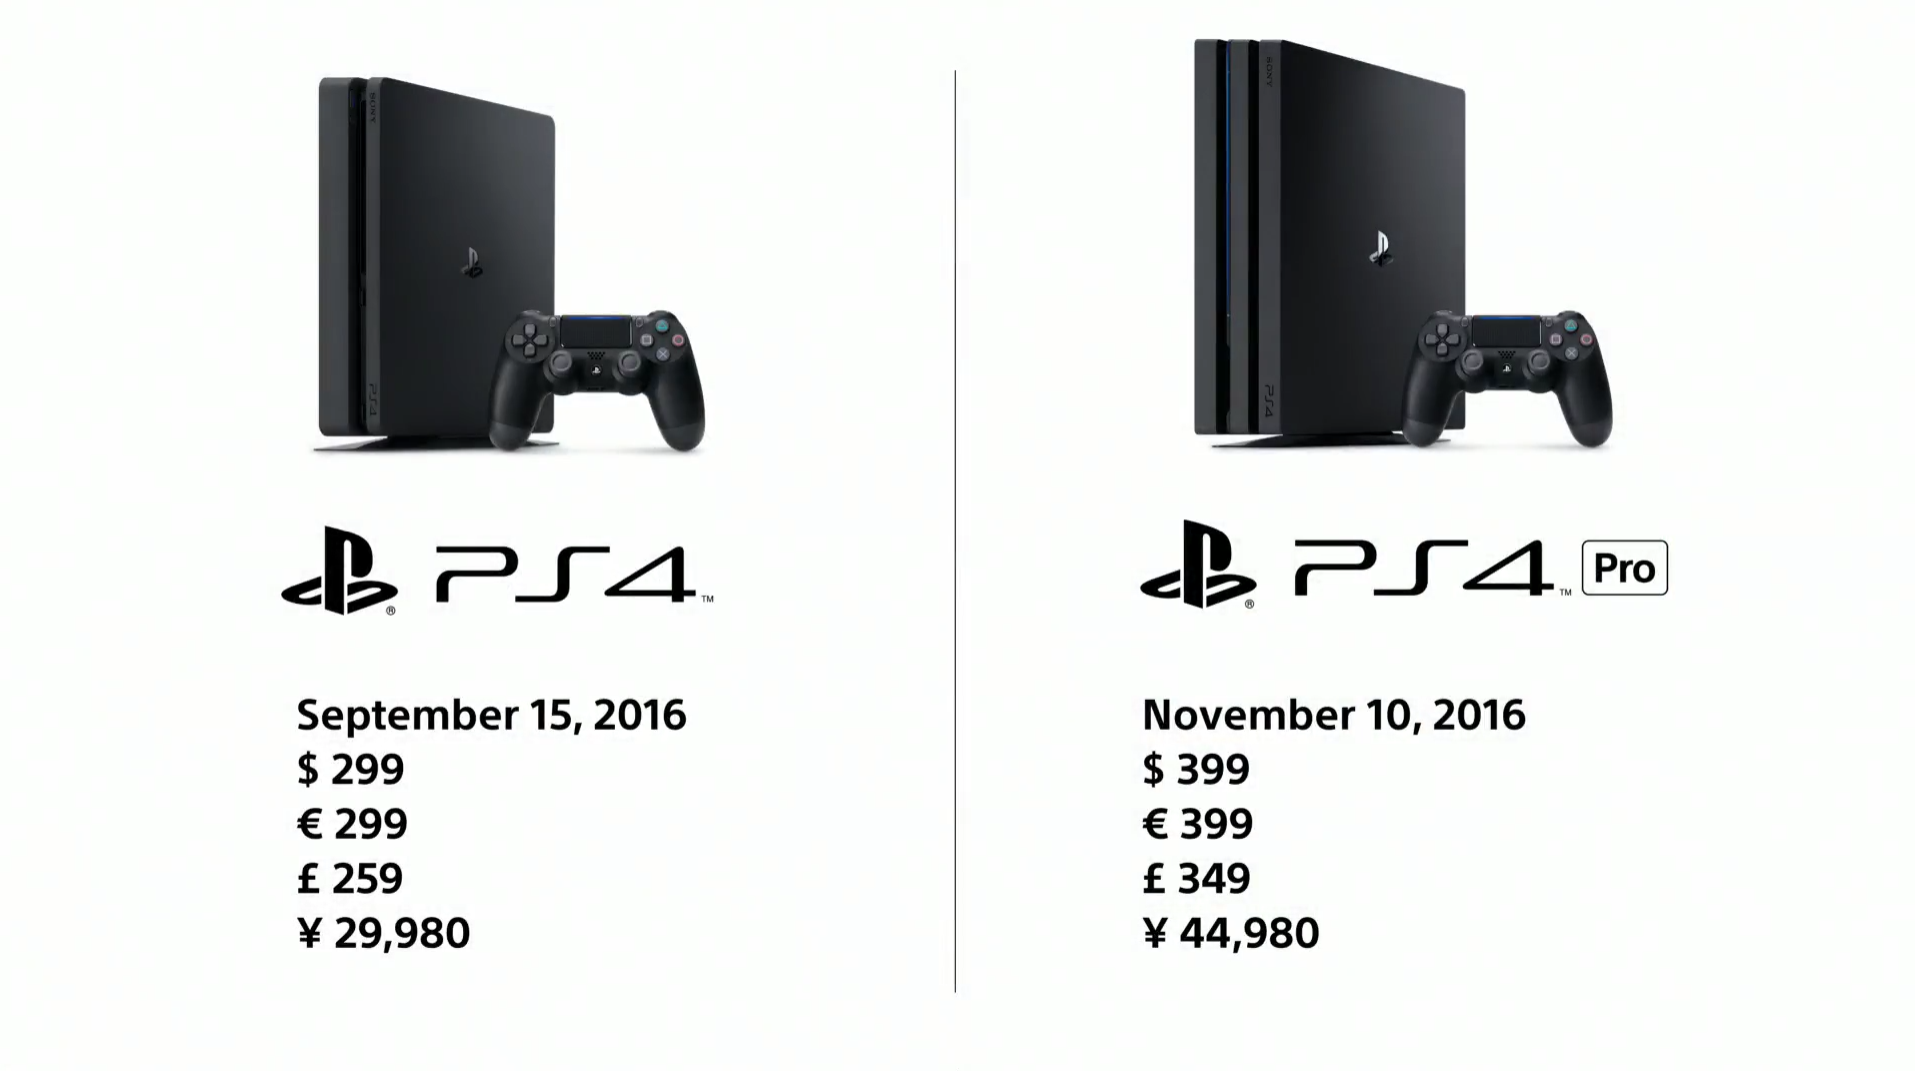 PS4 Pro & Slim